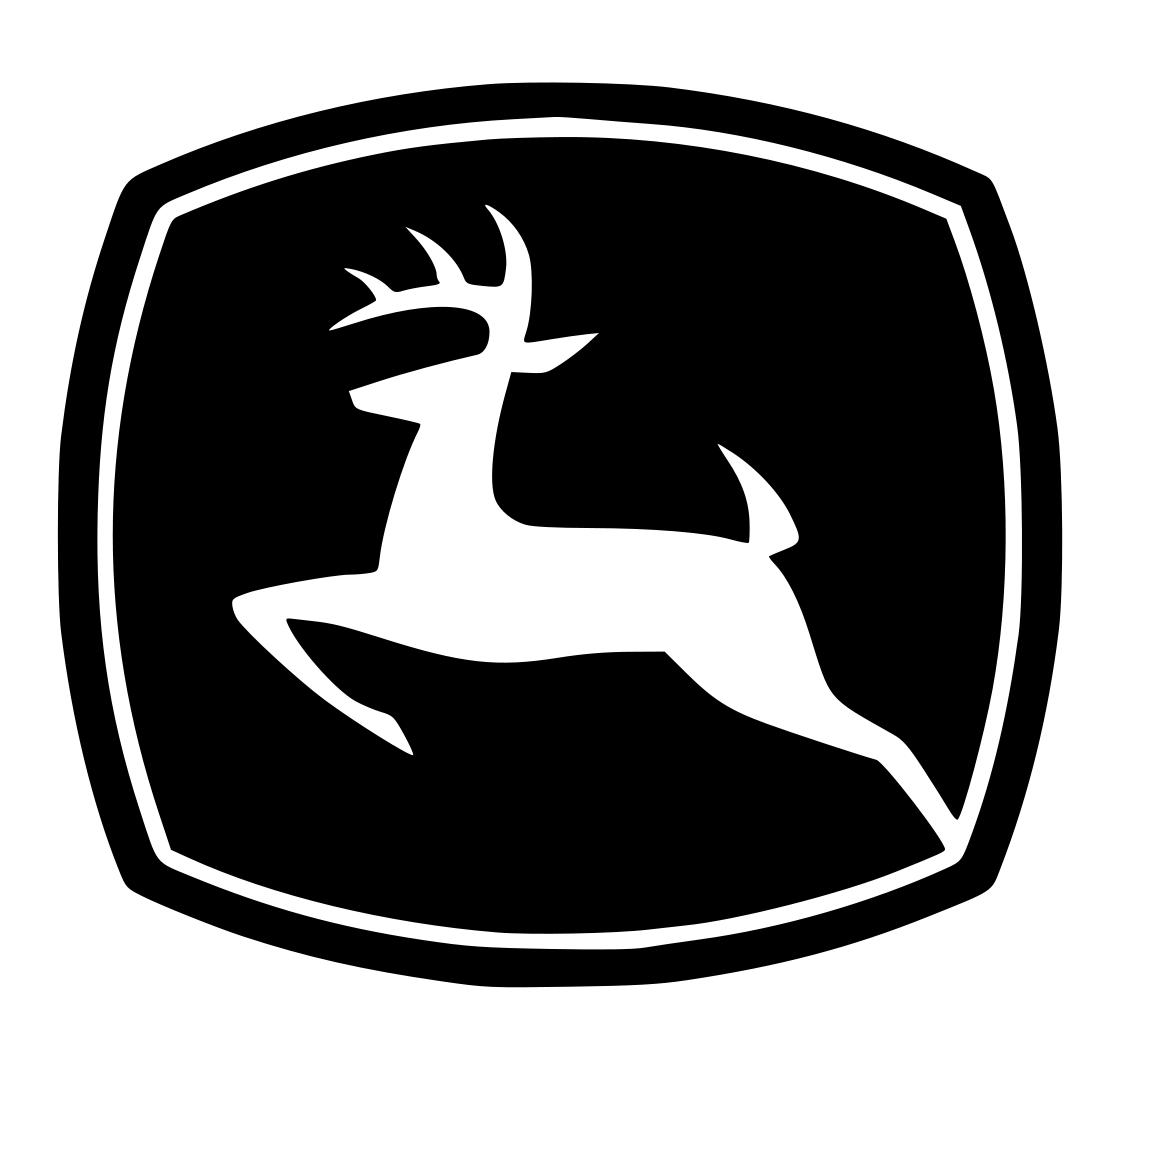 John Deere Logo Silhouette.